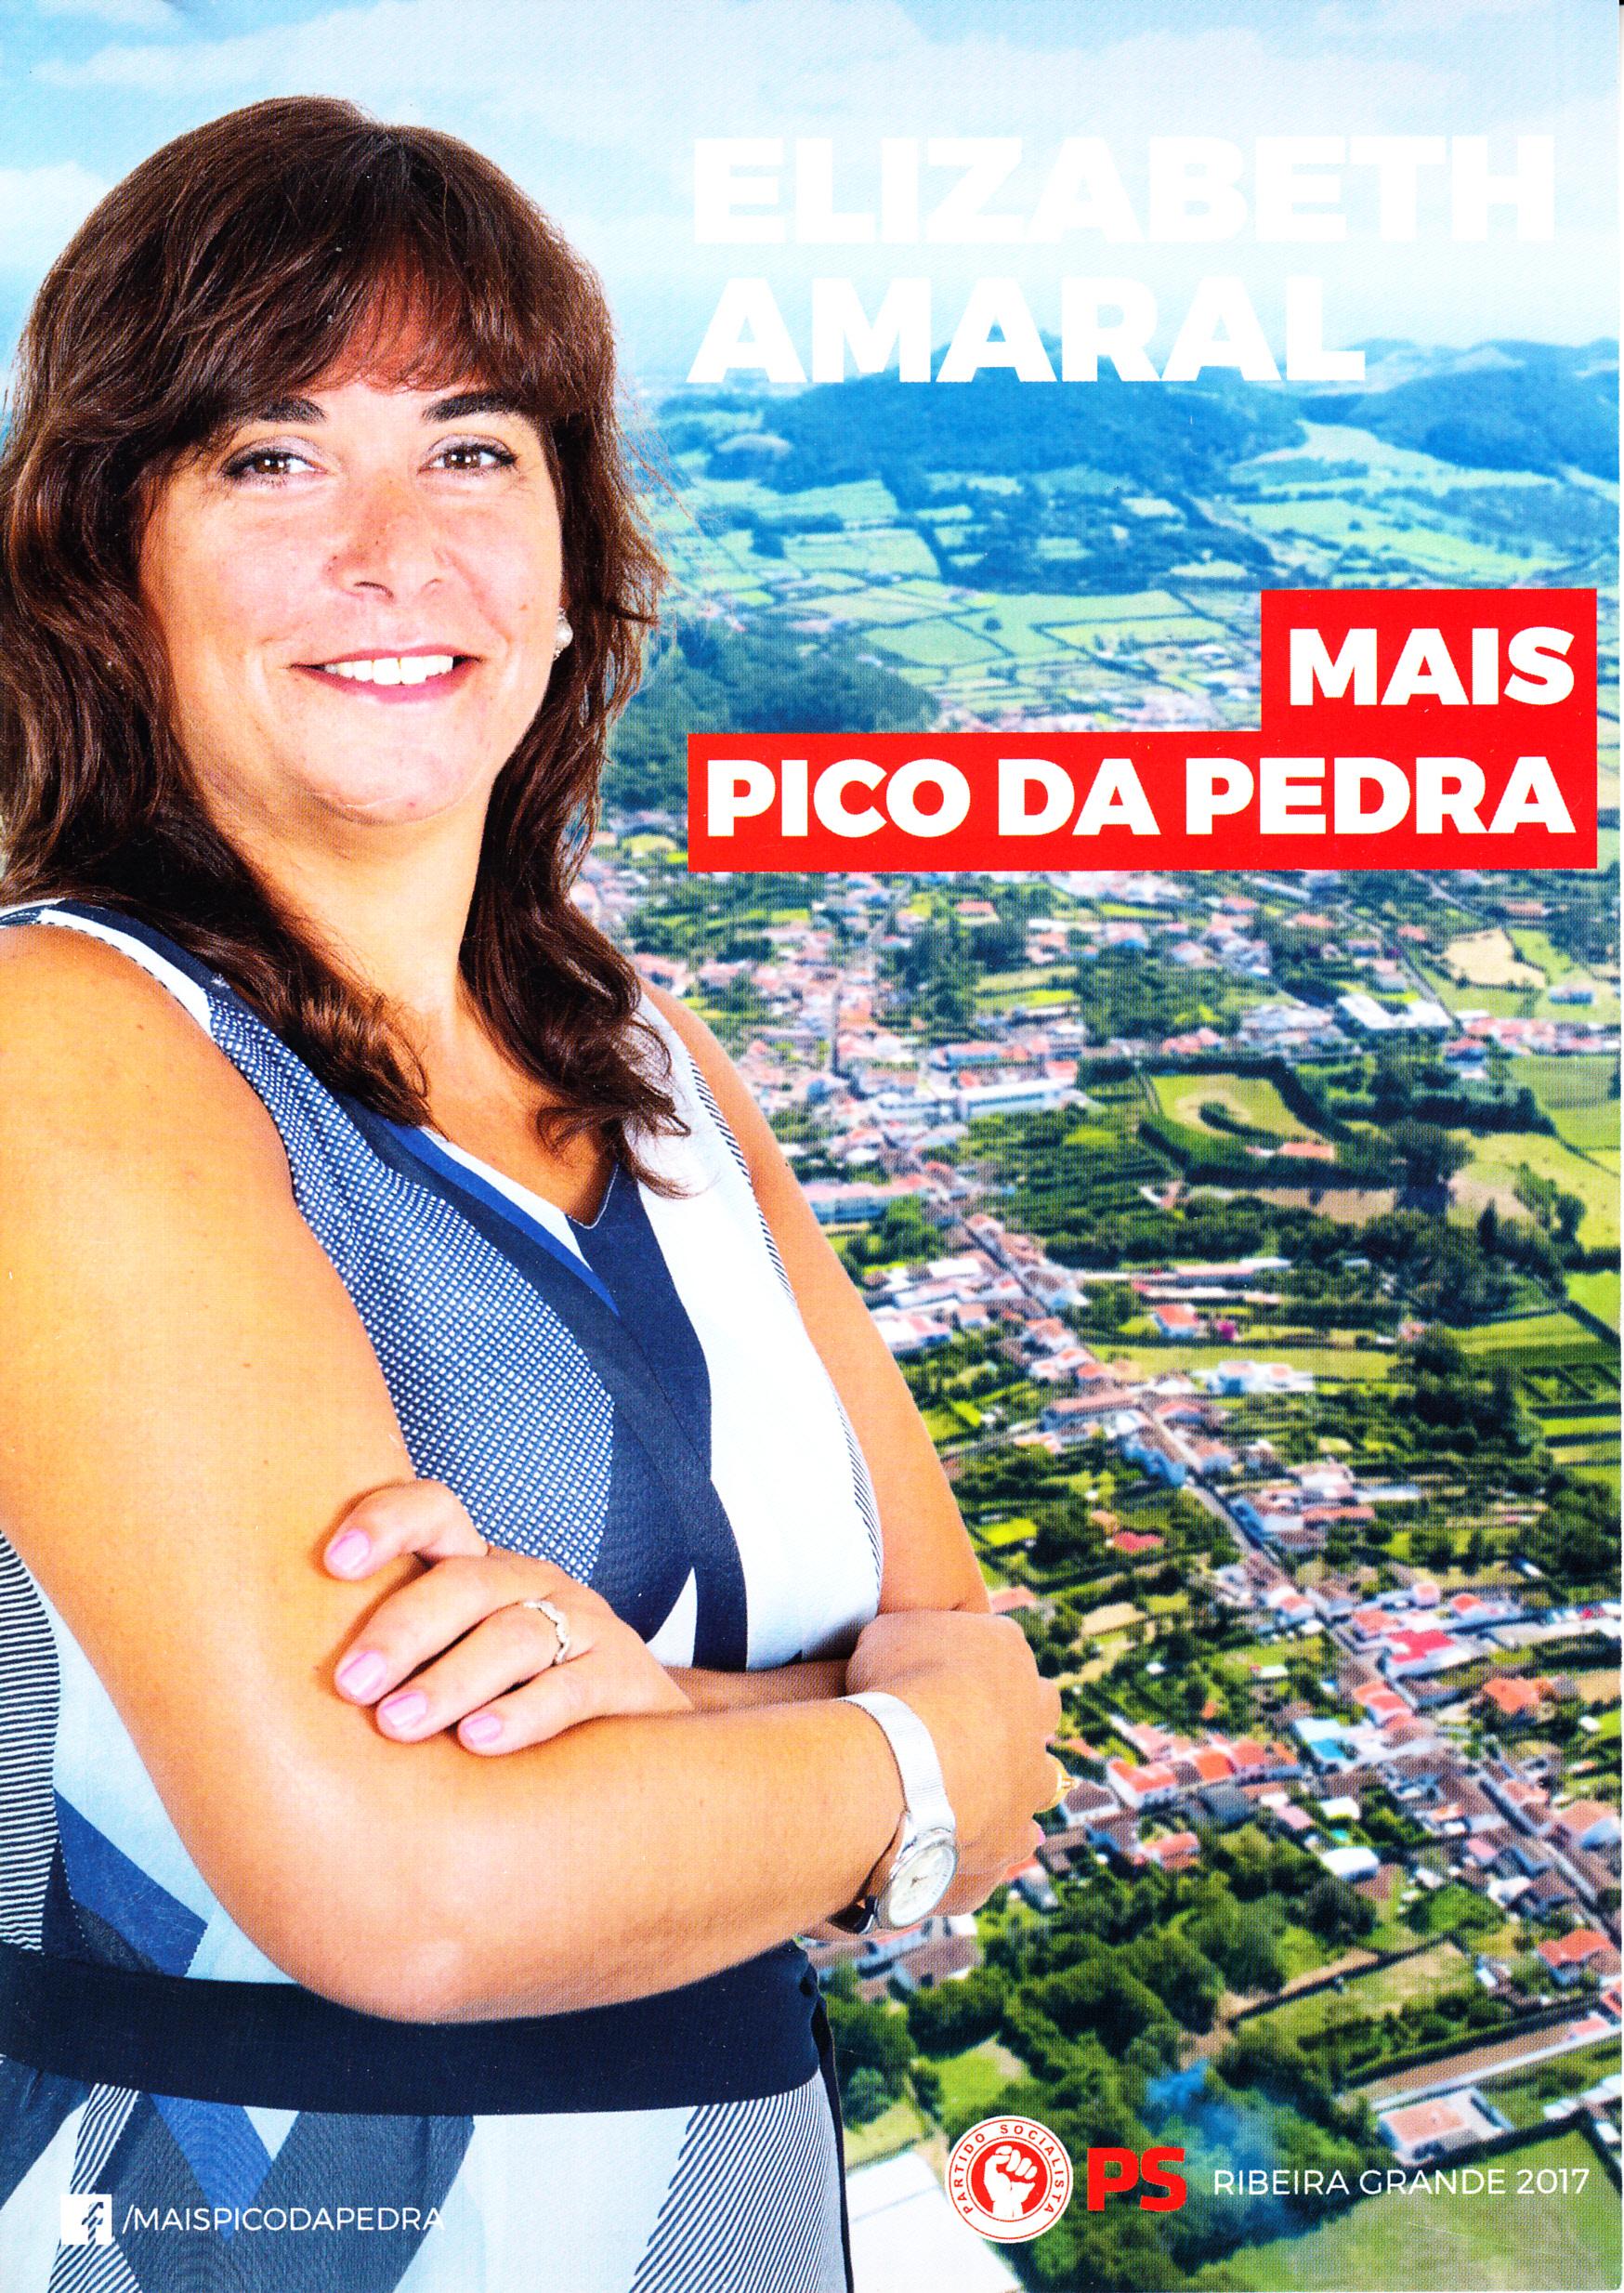 PS_2017_Pico Pedra_0003